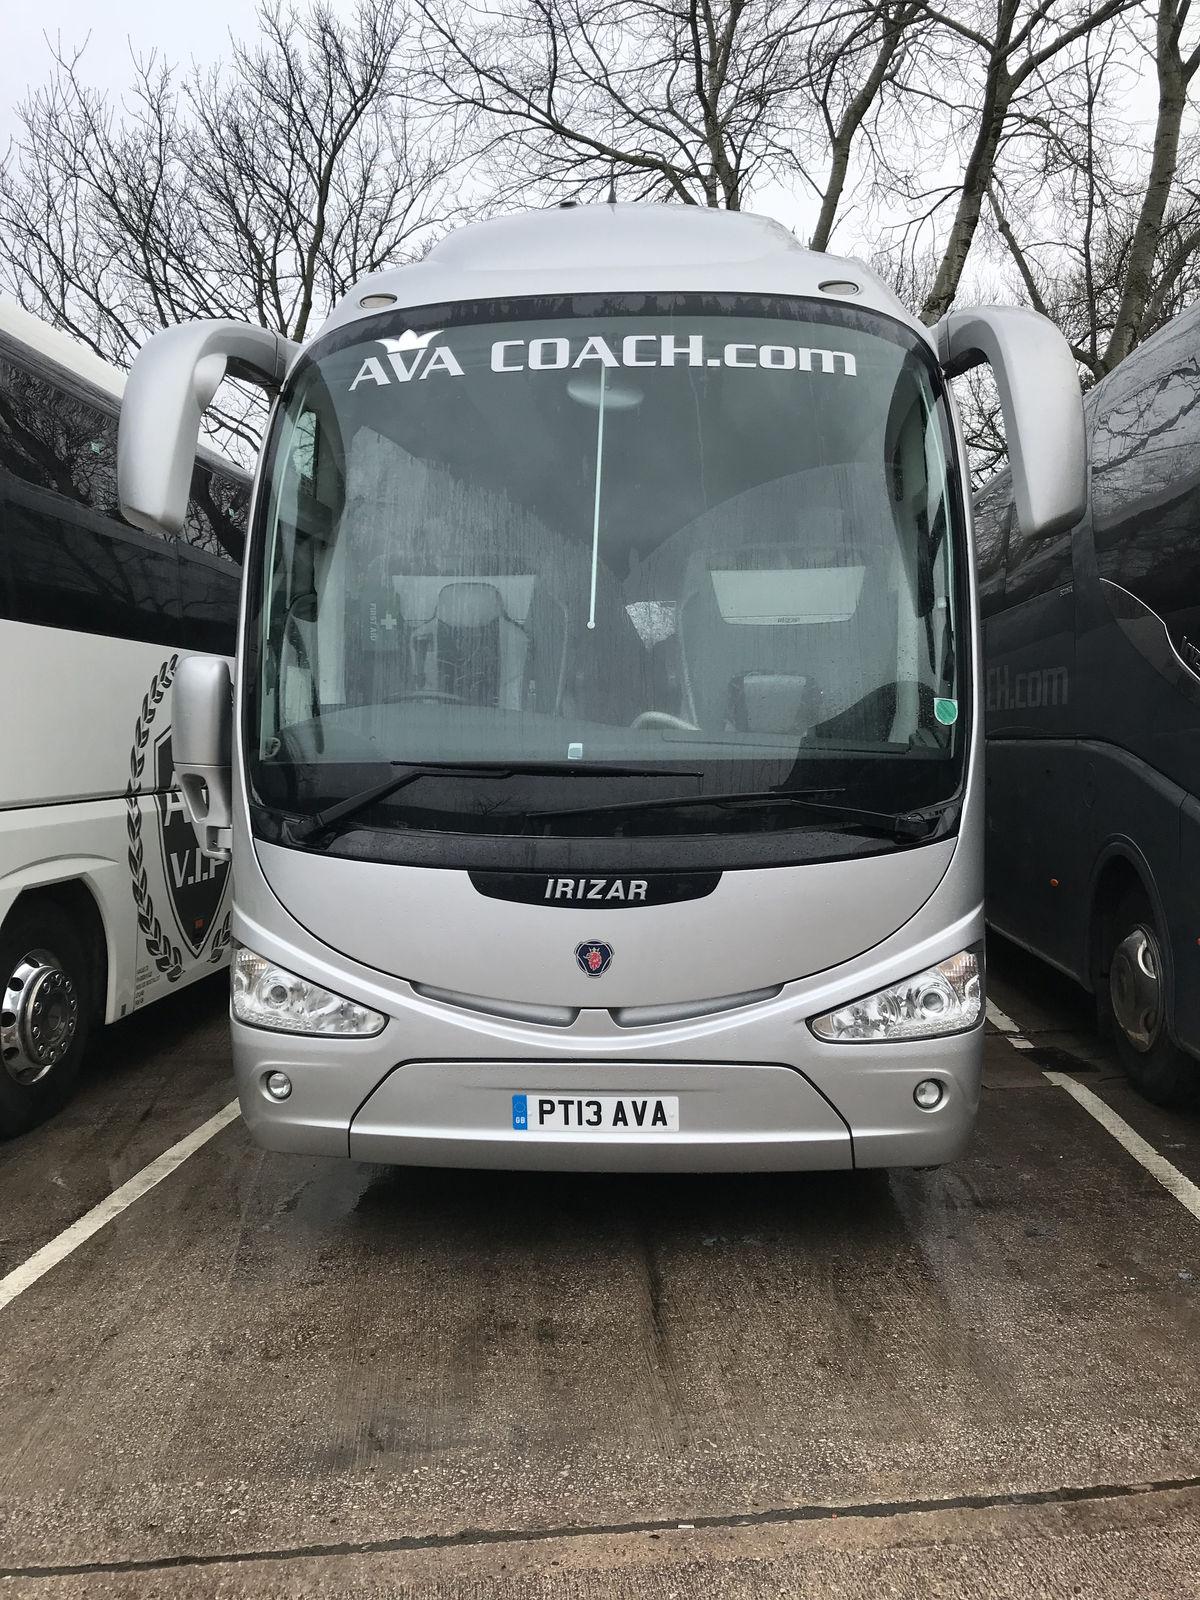 coach PT13 AVA